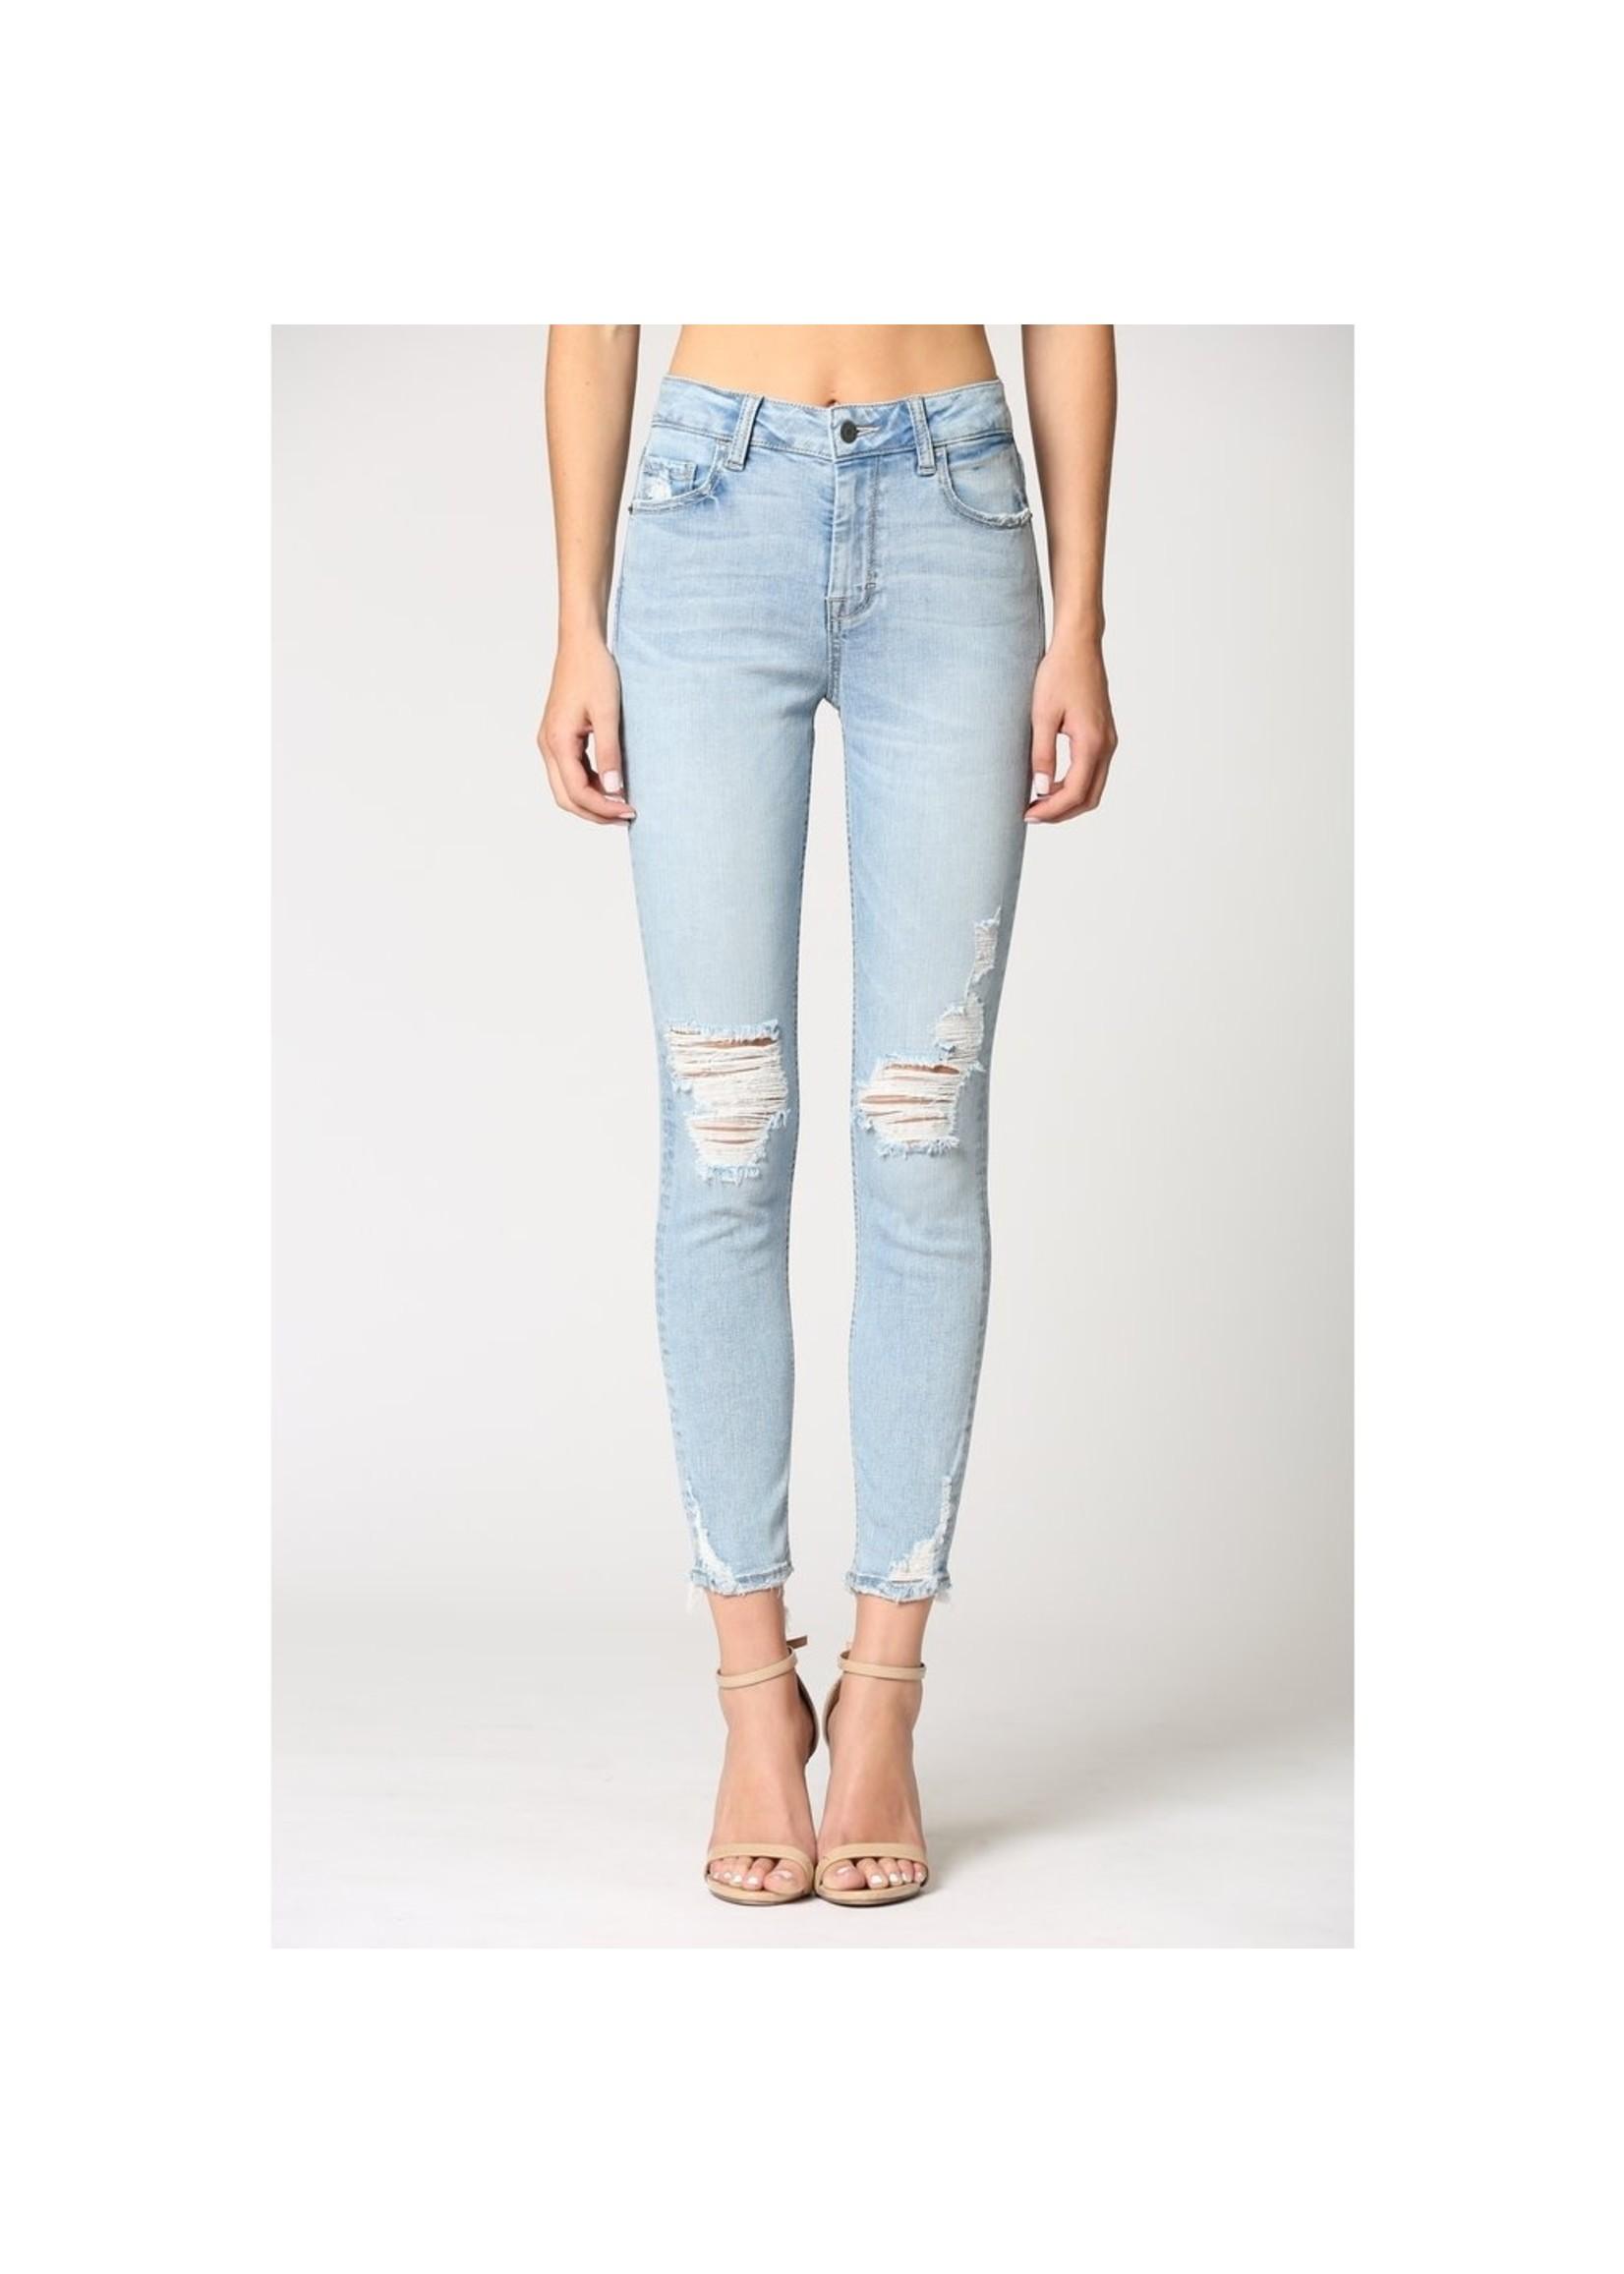 Hidden Jean Amelia Light Wash Distressed Skinny Jeans